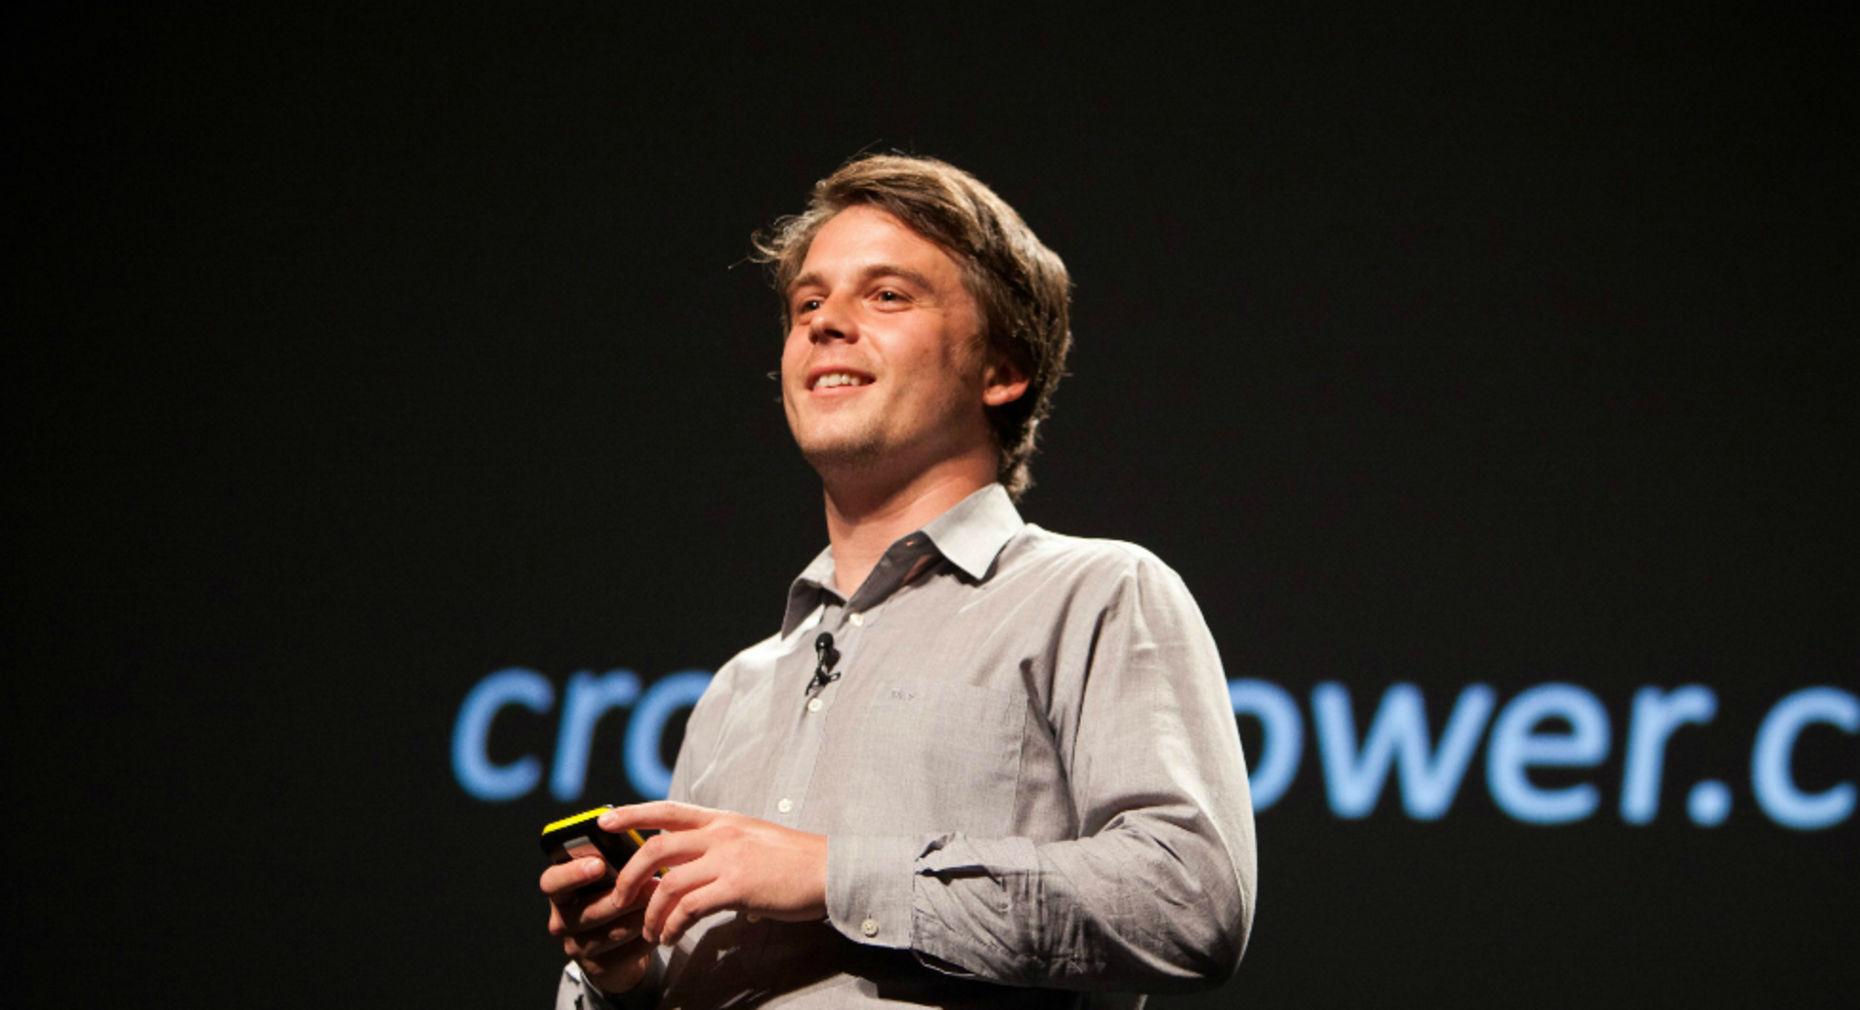 CrowdFlower CEO Lukas Biewald. Photo by Bloomberg.